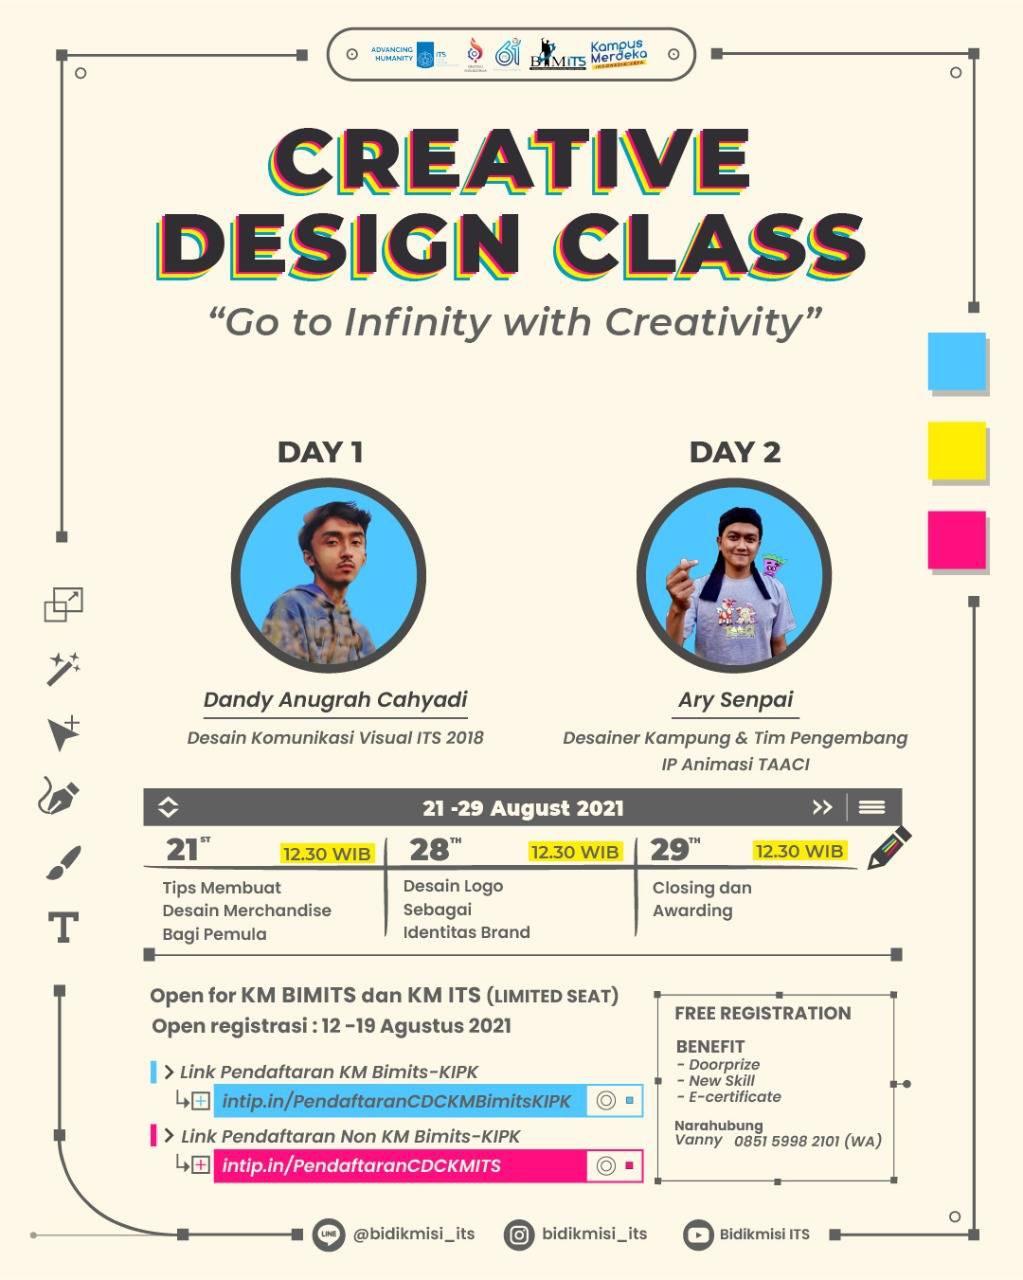 [CREATIVE DESIGN CLASS]